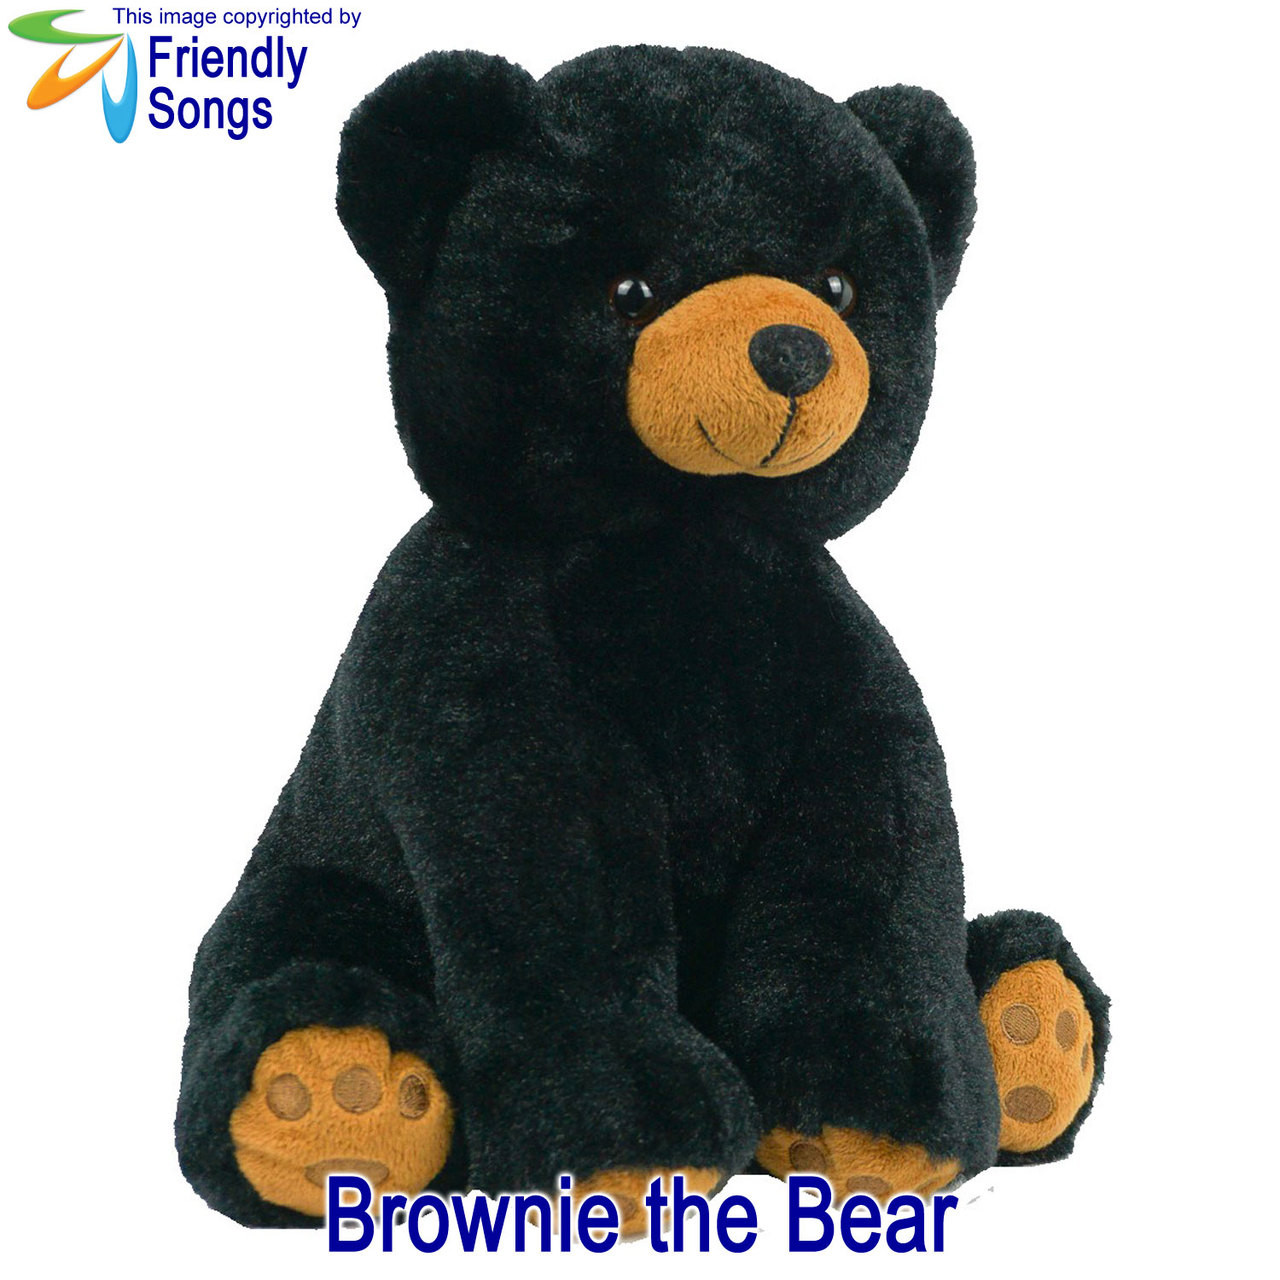 Brownie the Bear Personalized Stuffed Animal